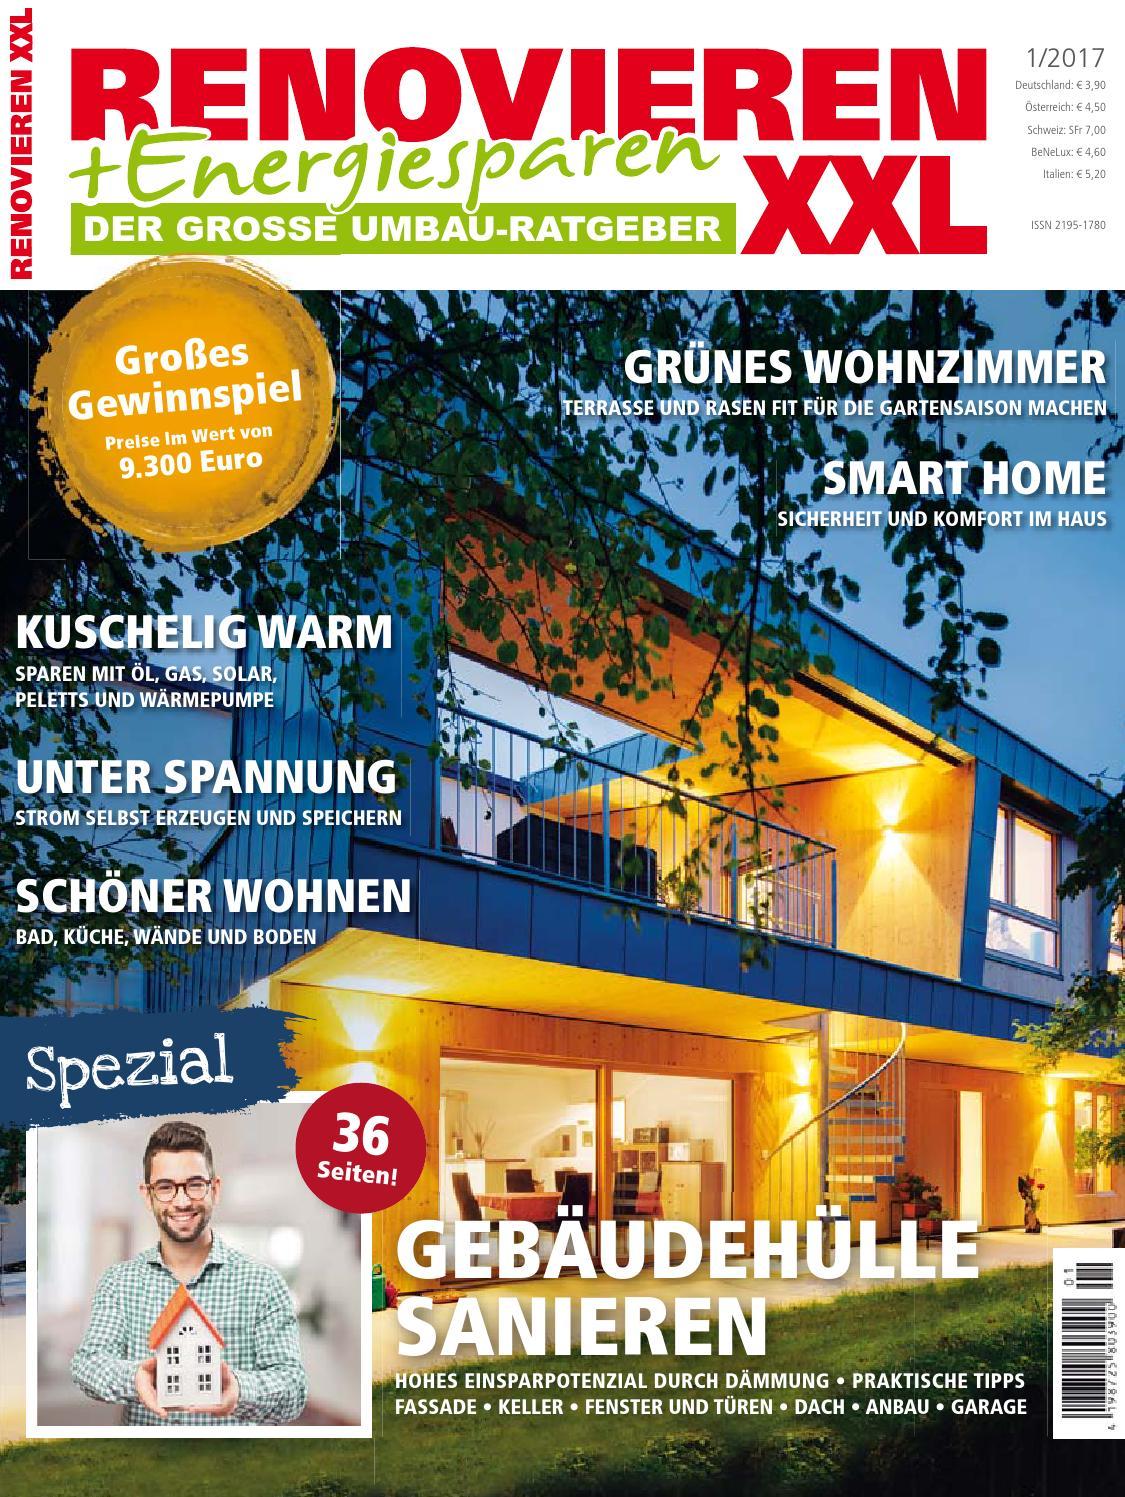 Renovieren Energiesparen 1 2017 By Family Home Verlag Gmbh Issuu